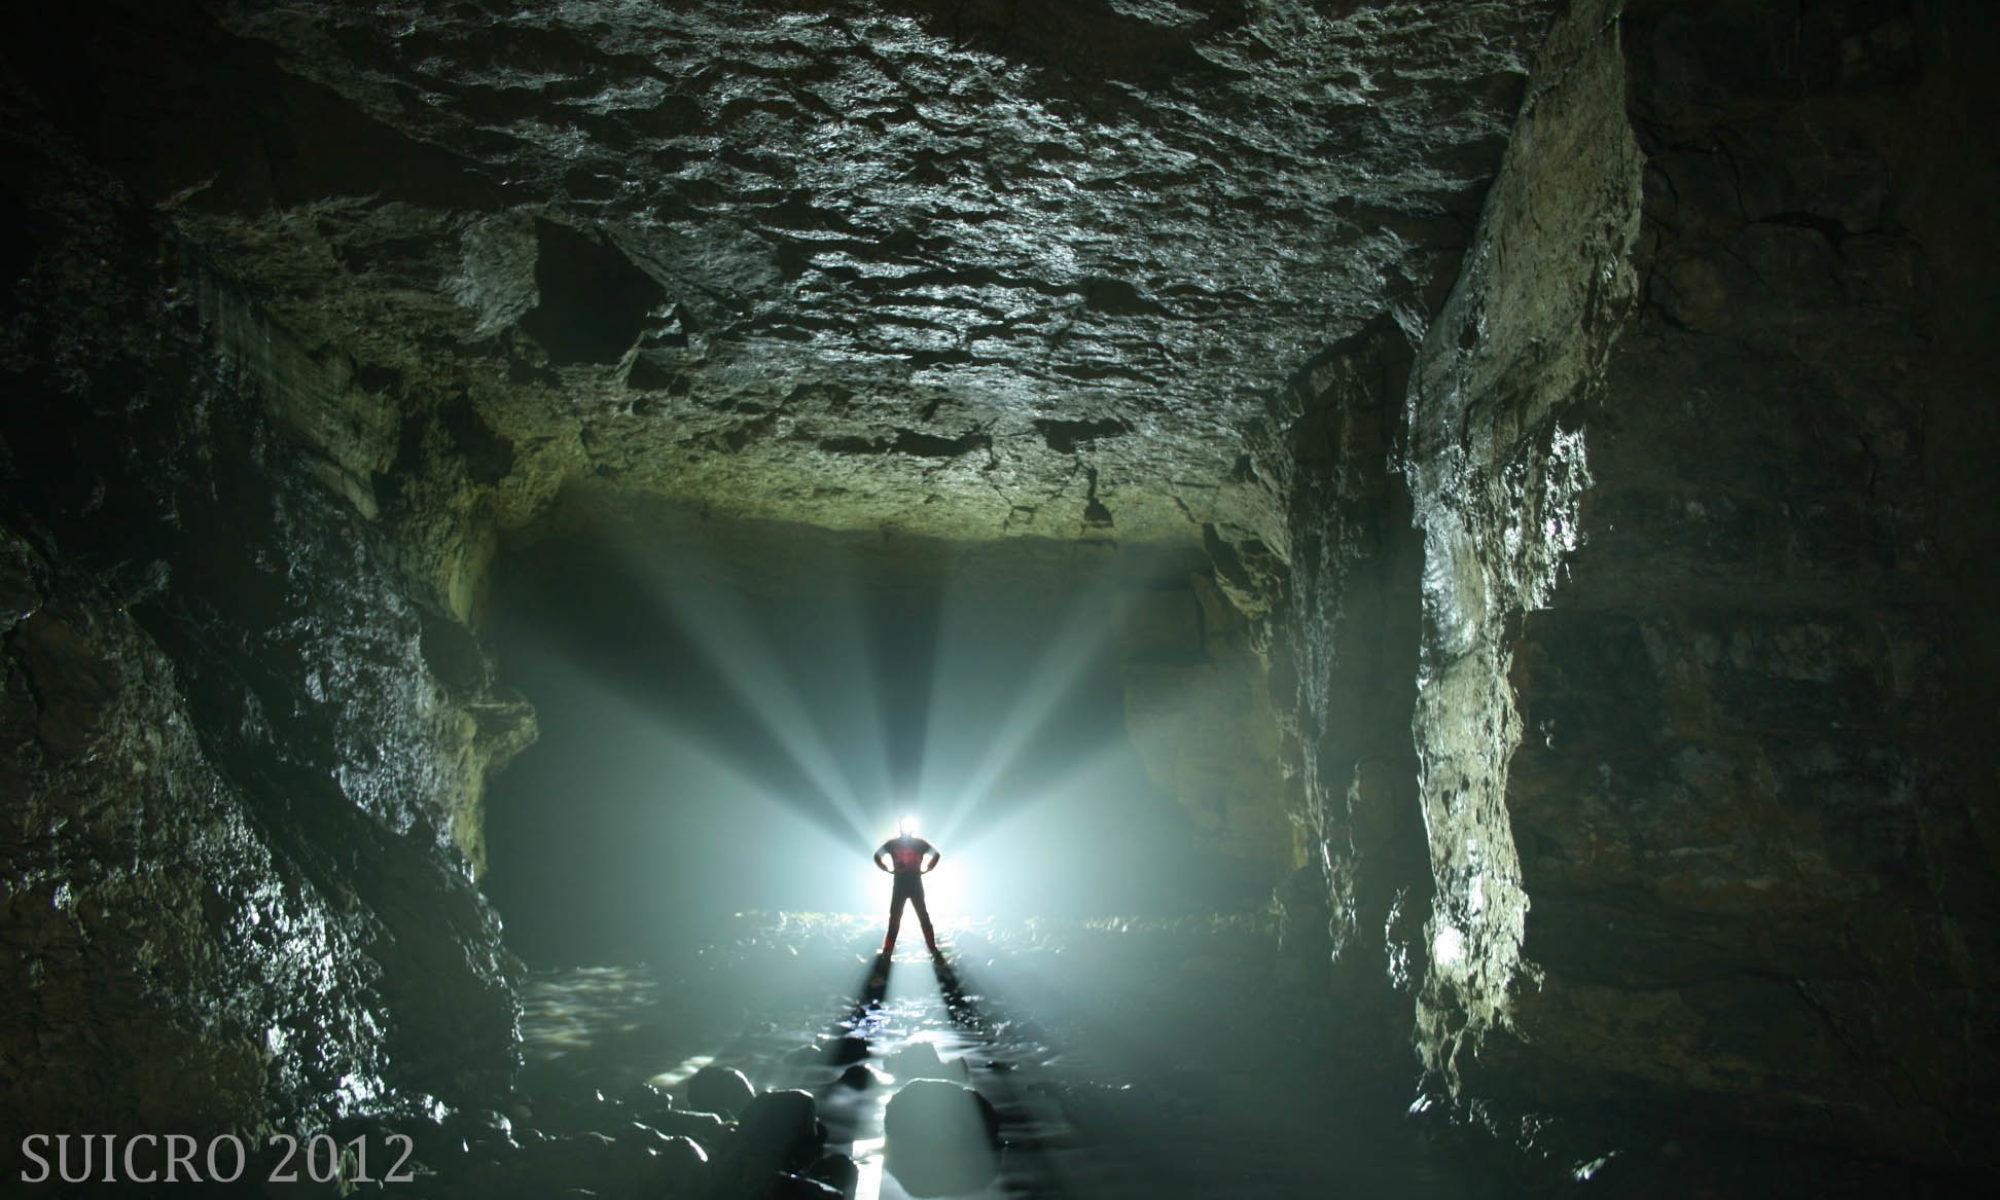 The Speleological Union of Ireland  and Irish Cave Rescue Organisation